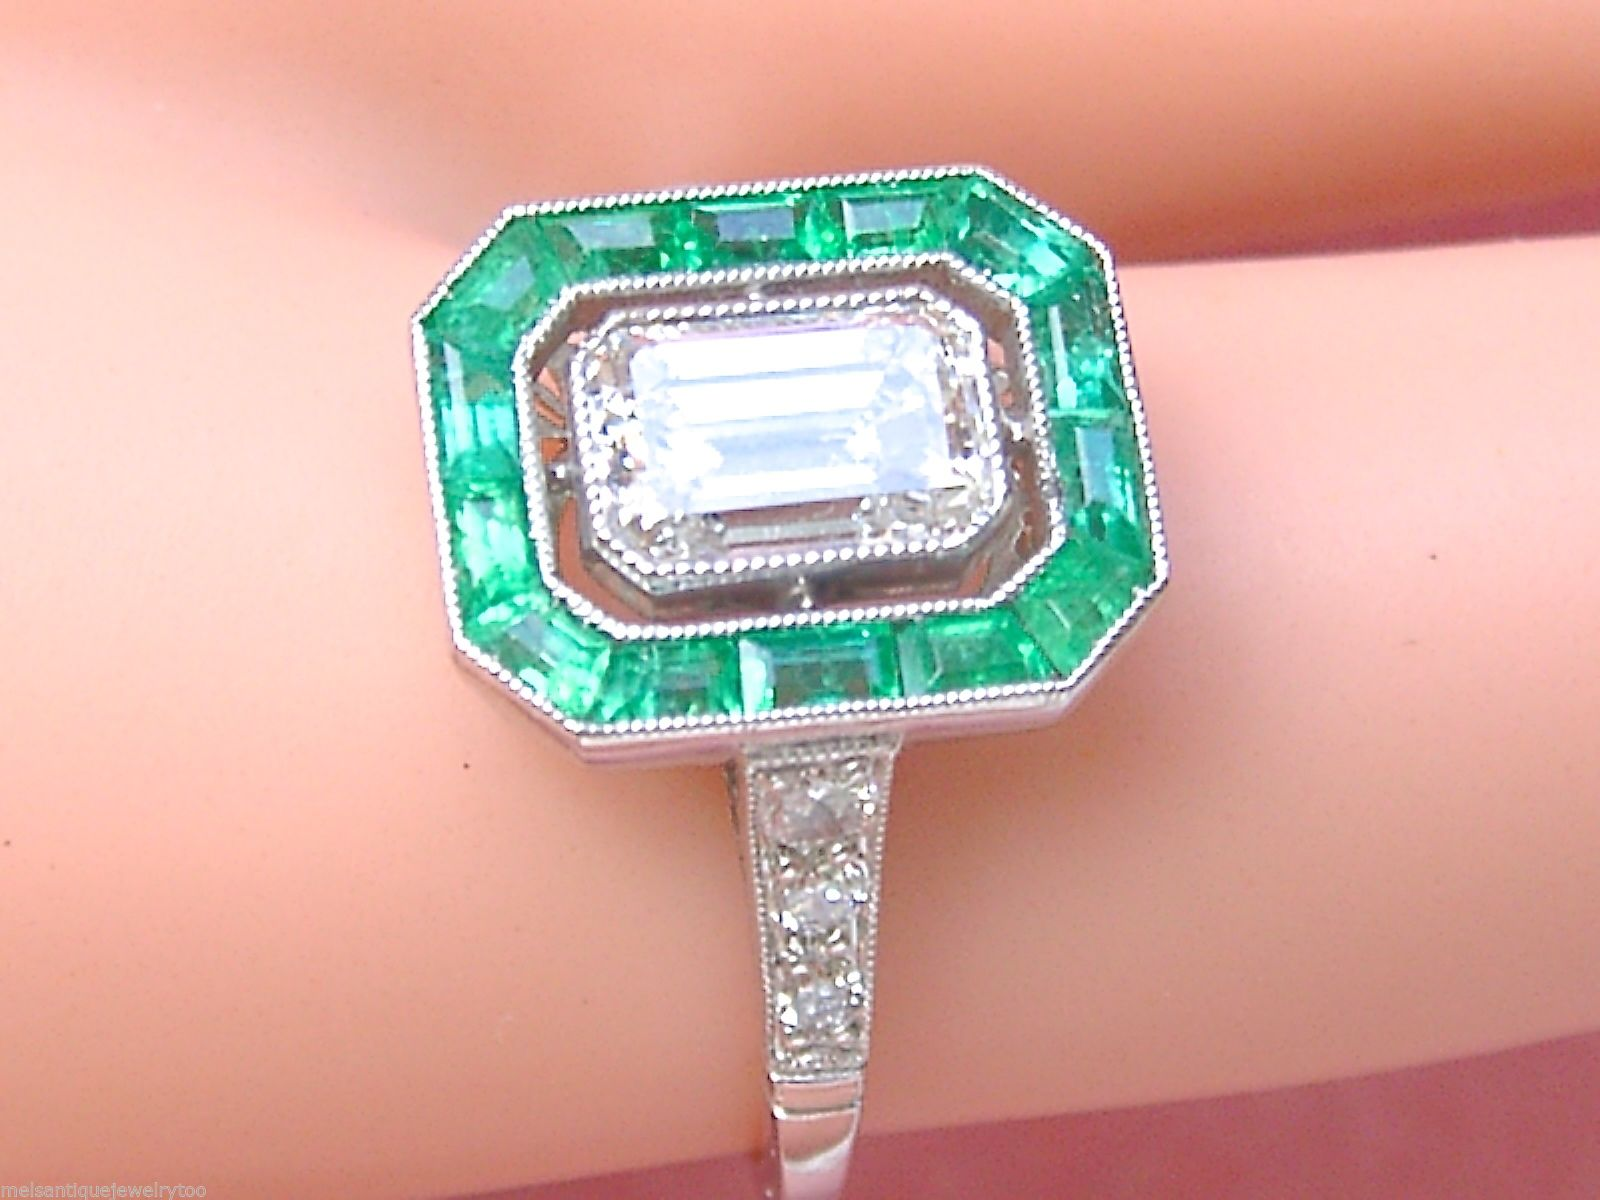 Art Deco 1.03 Ct Emerald Cut Diamond GIA 'E' Color Emerald Halo Engagement Ring